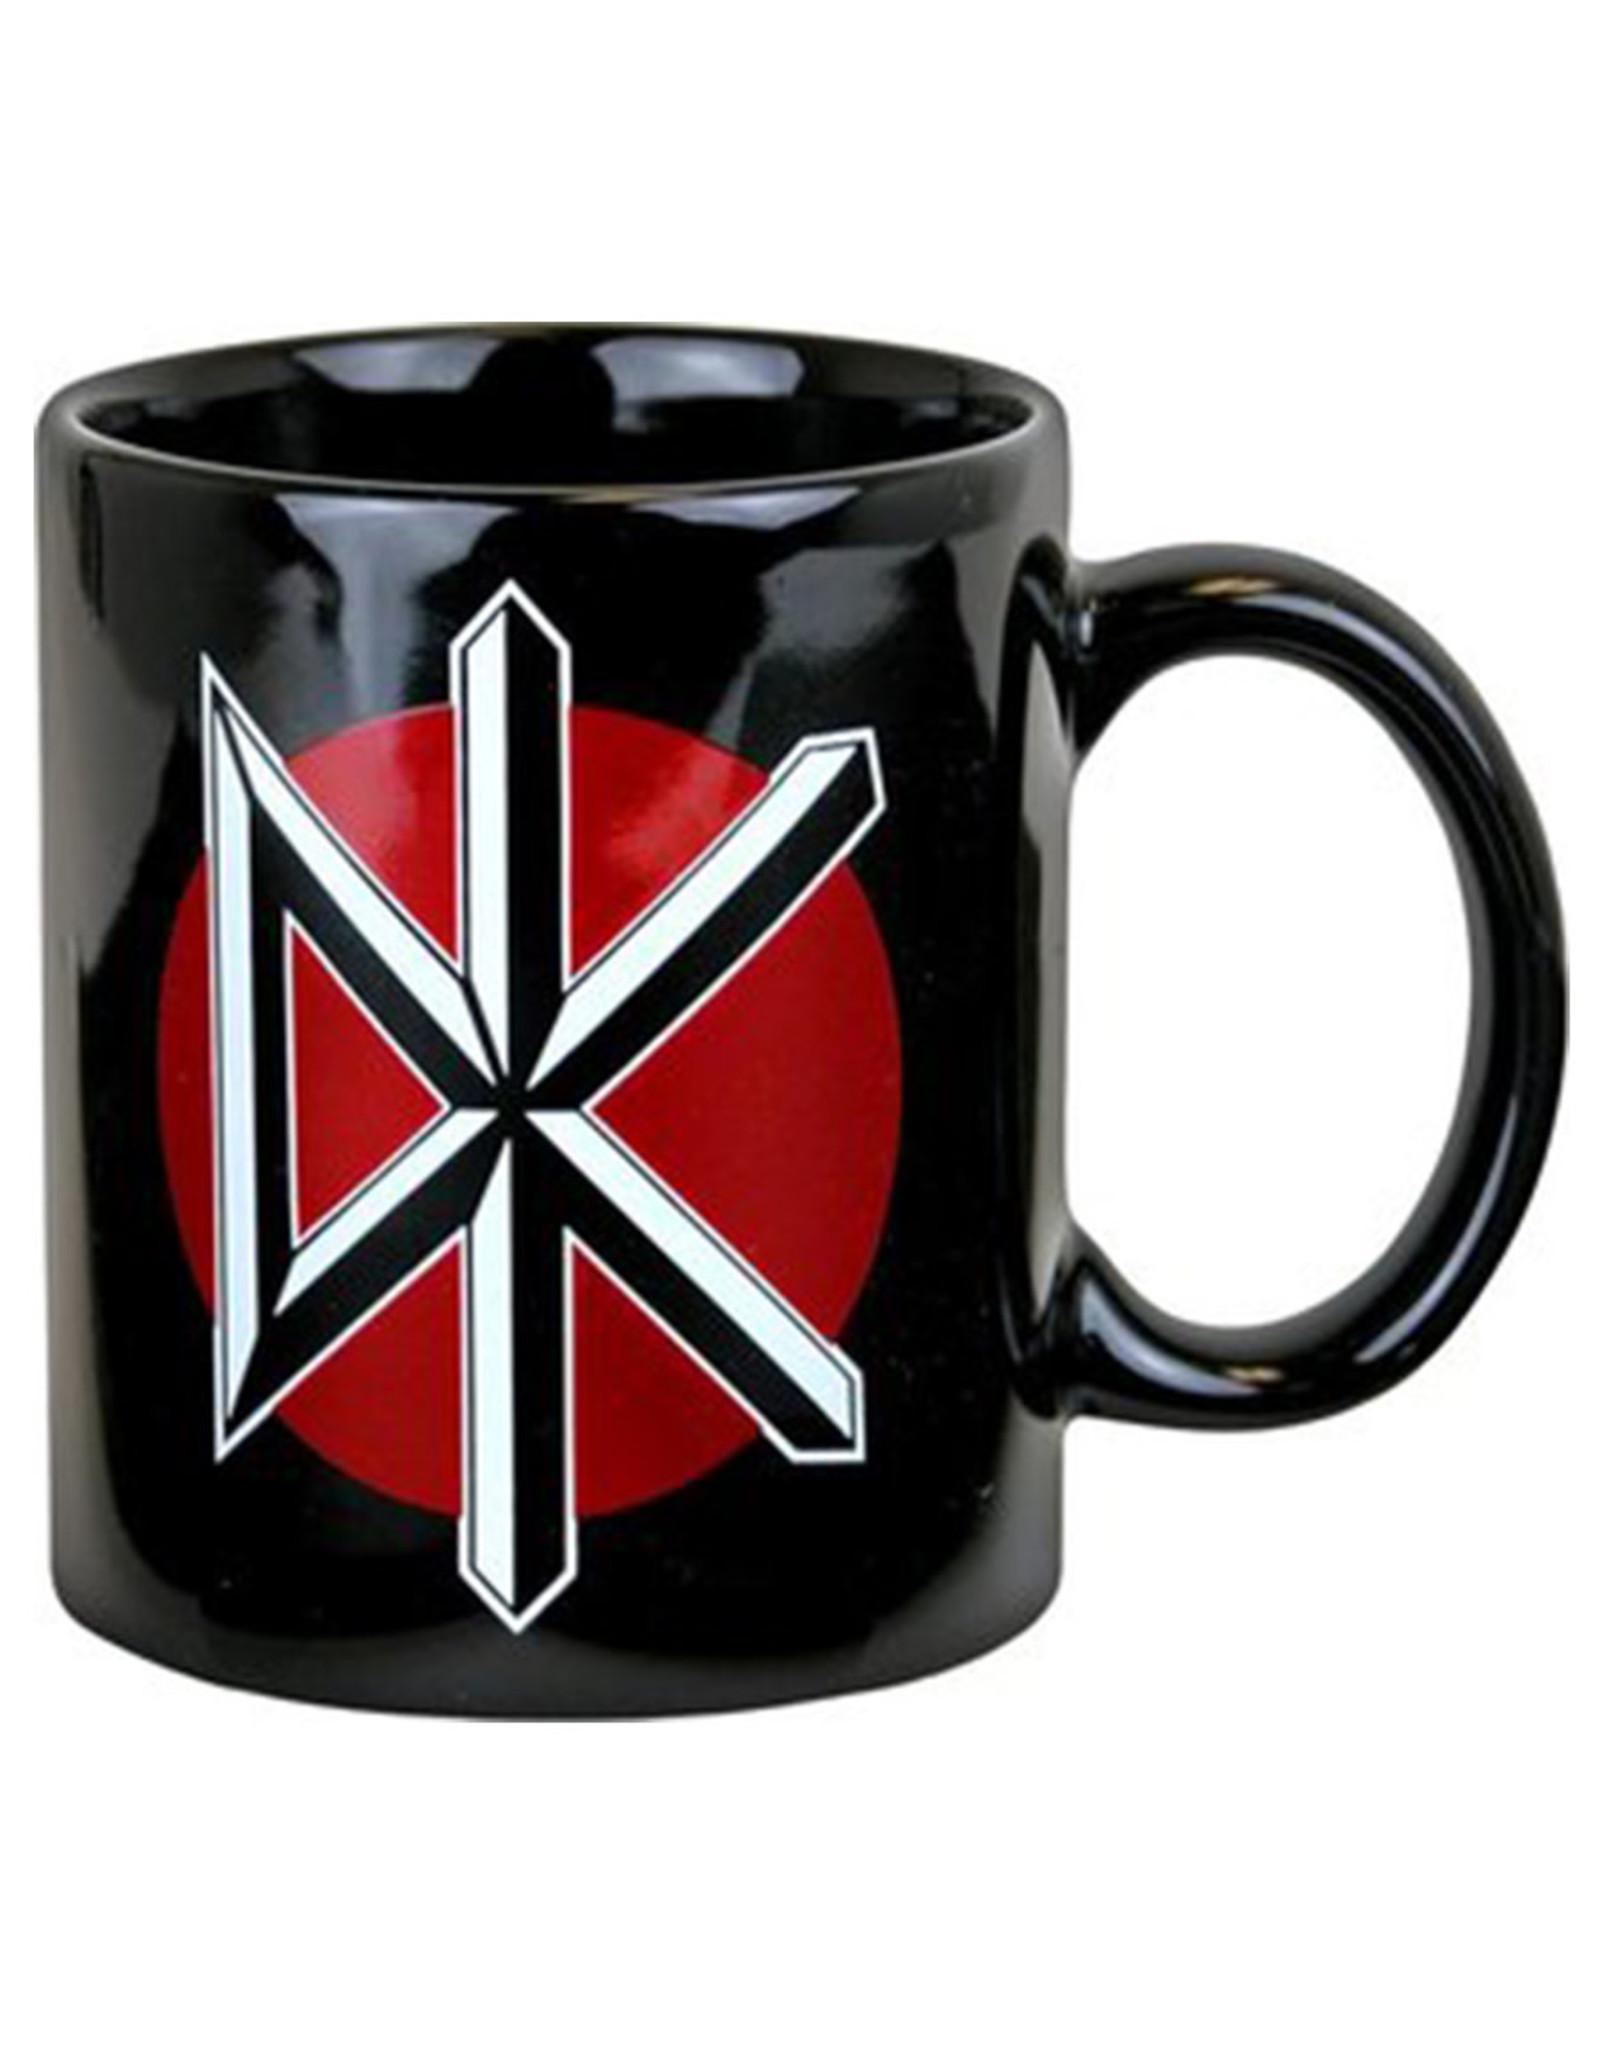 Star 500 Concert Series On Hollywood Mug Dead Kennedys Logo (Black)